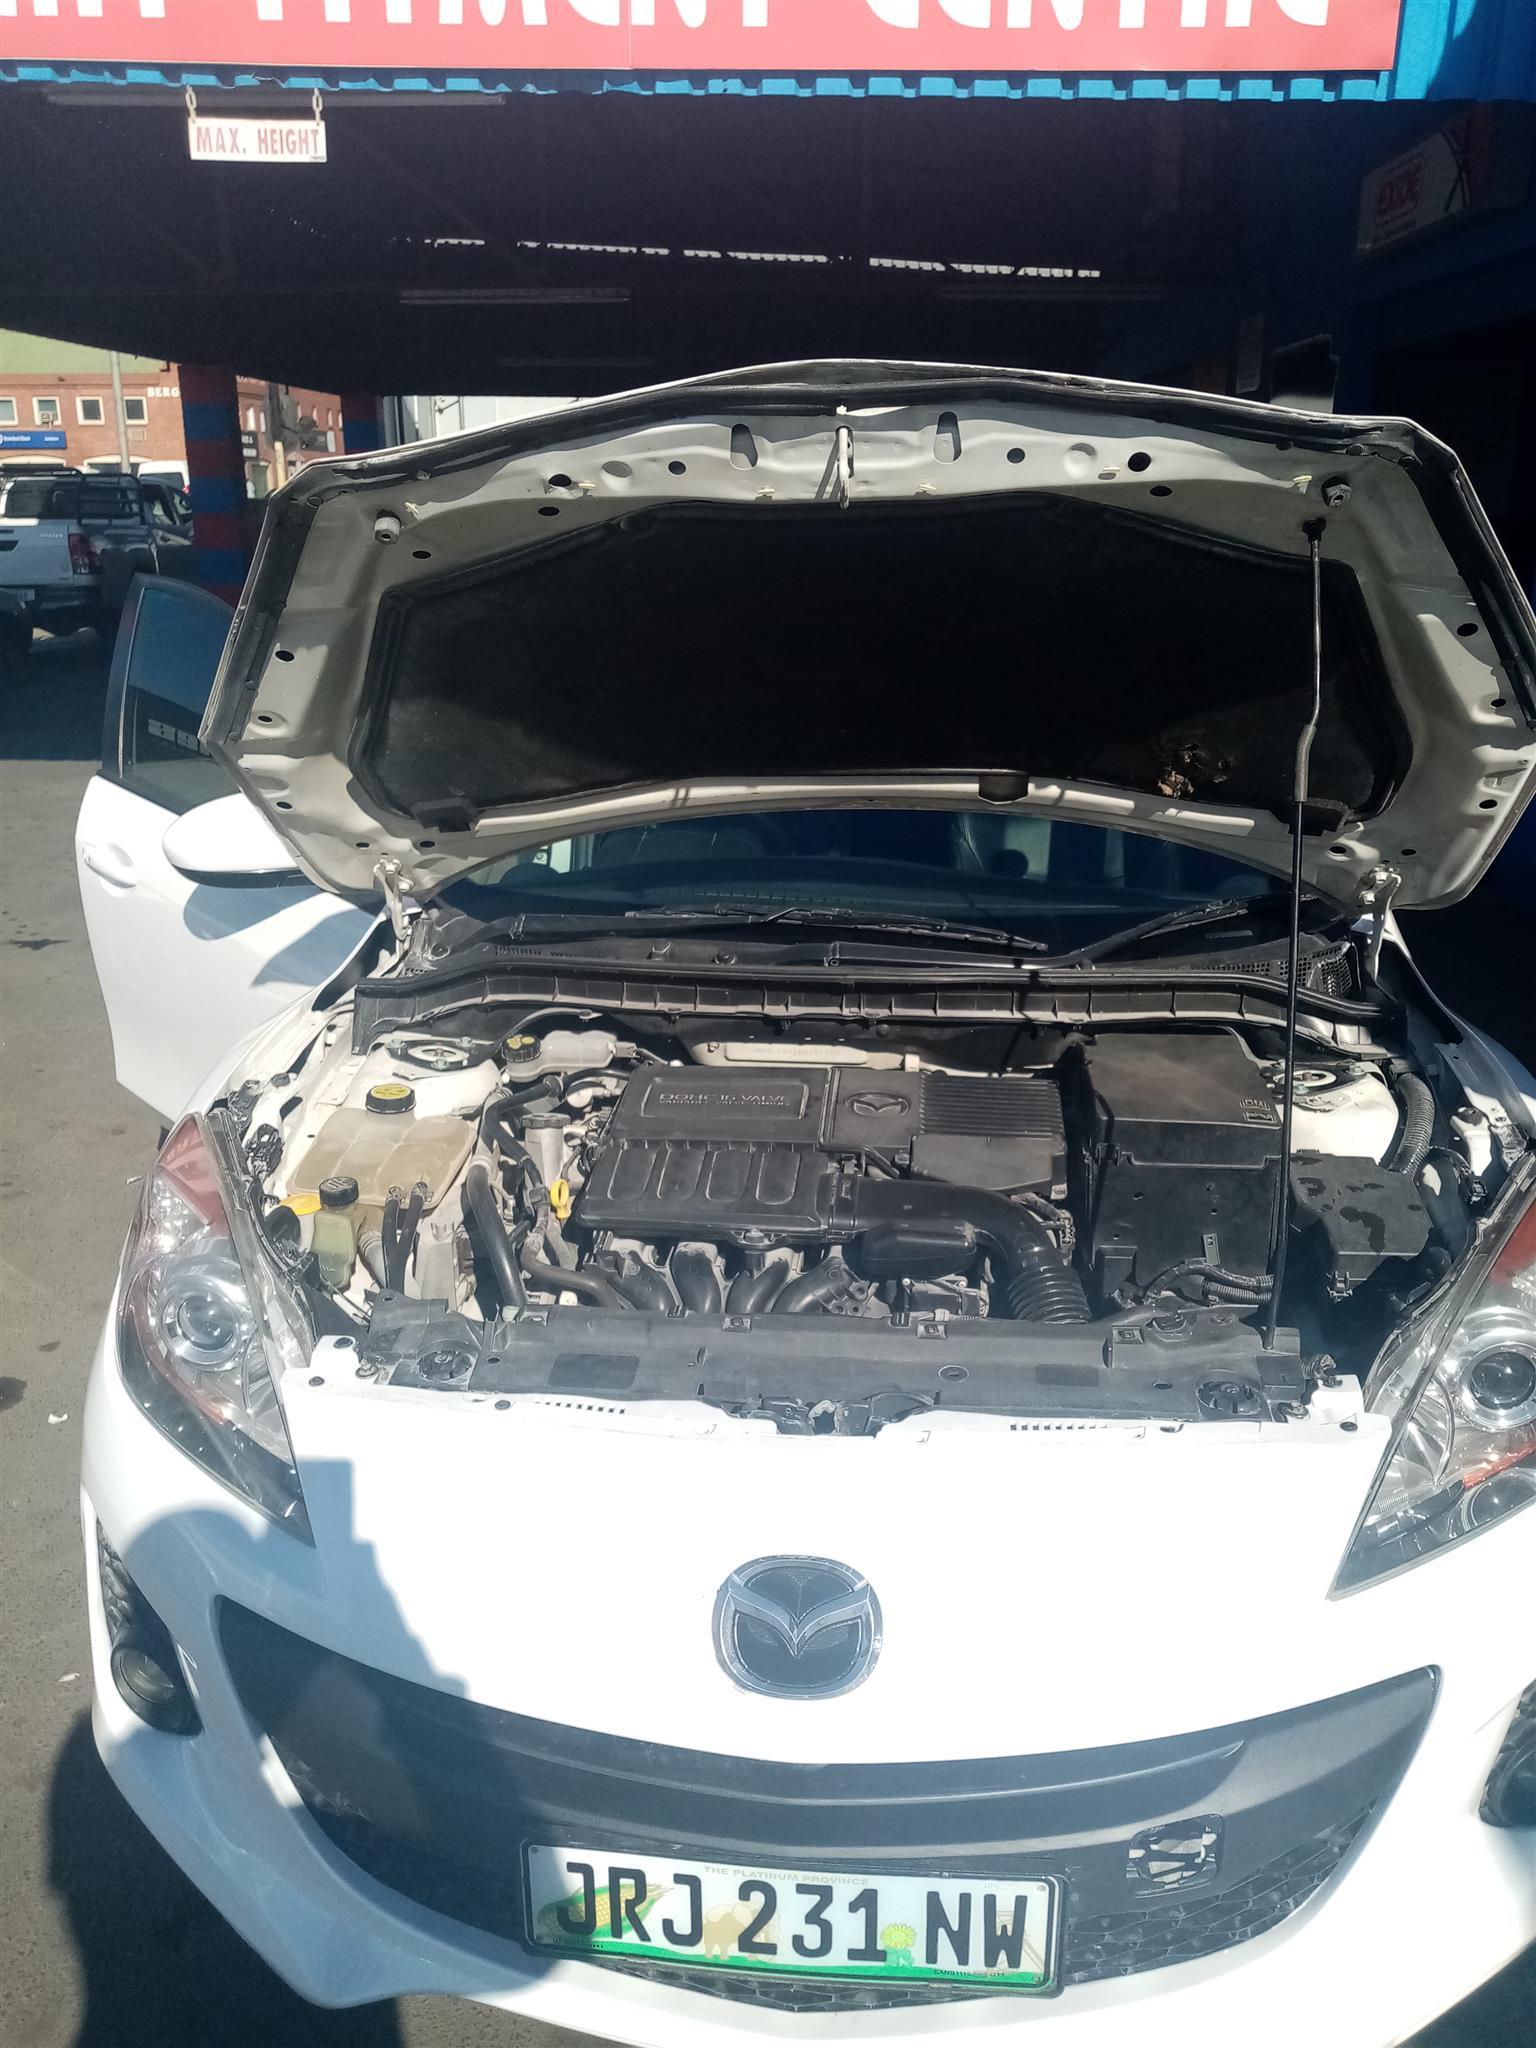 2013 Mazda Mazda3 hatch MAZDA3 1.5 DYNAMIC A/T 5DR